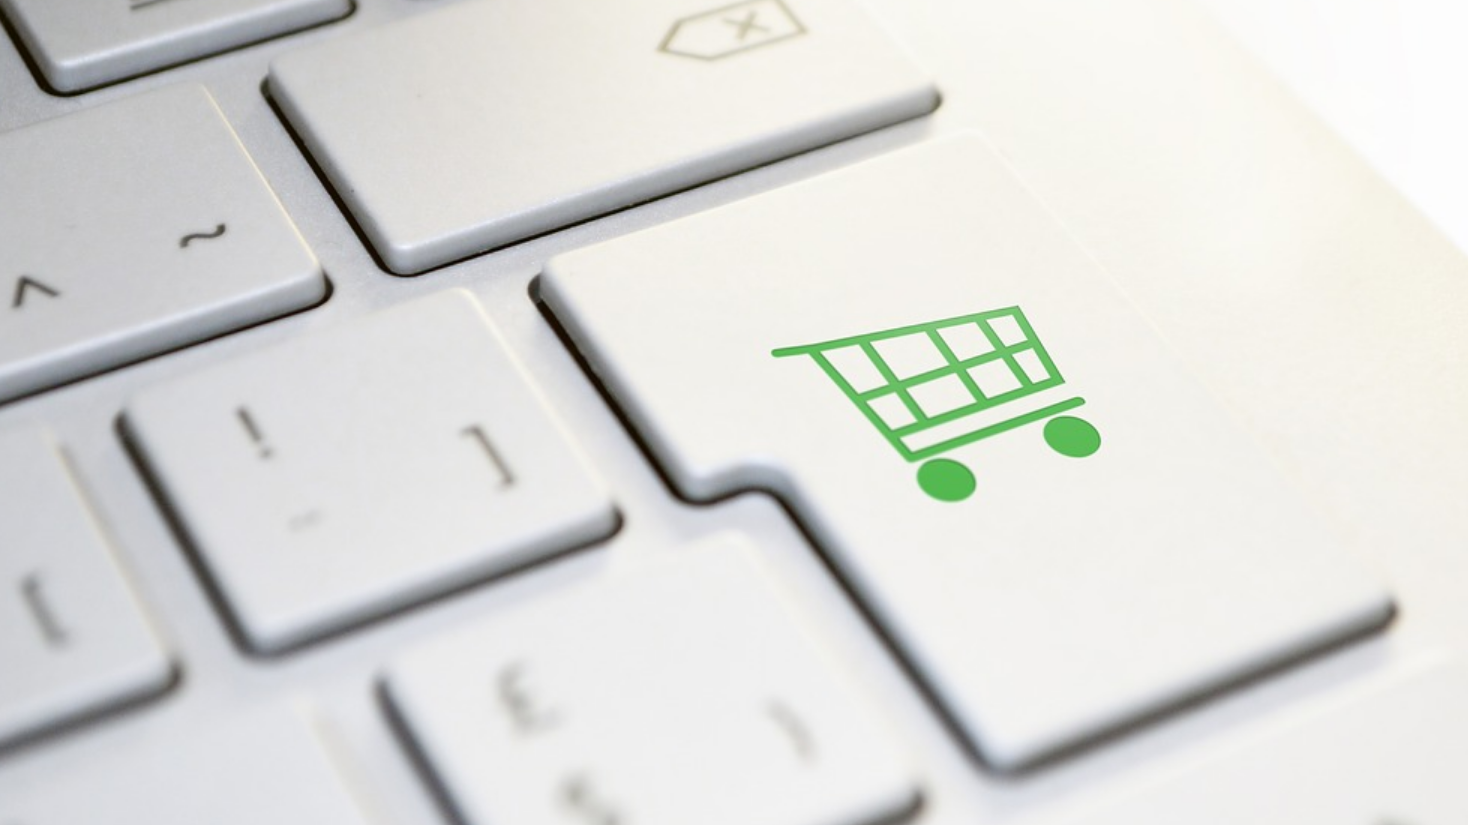 onlineshop-kaufen.png